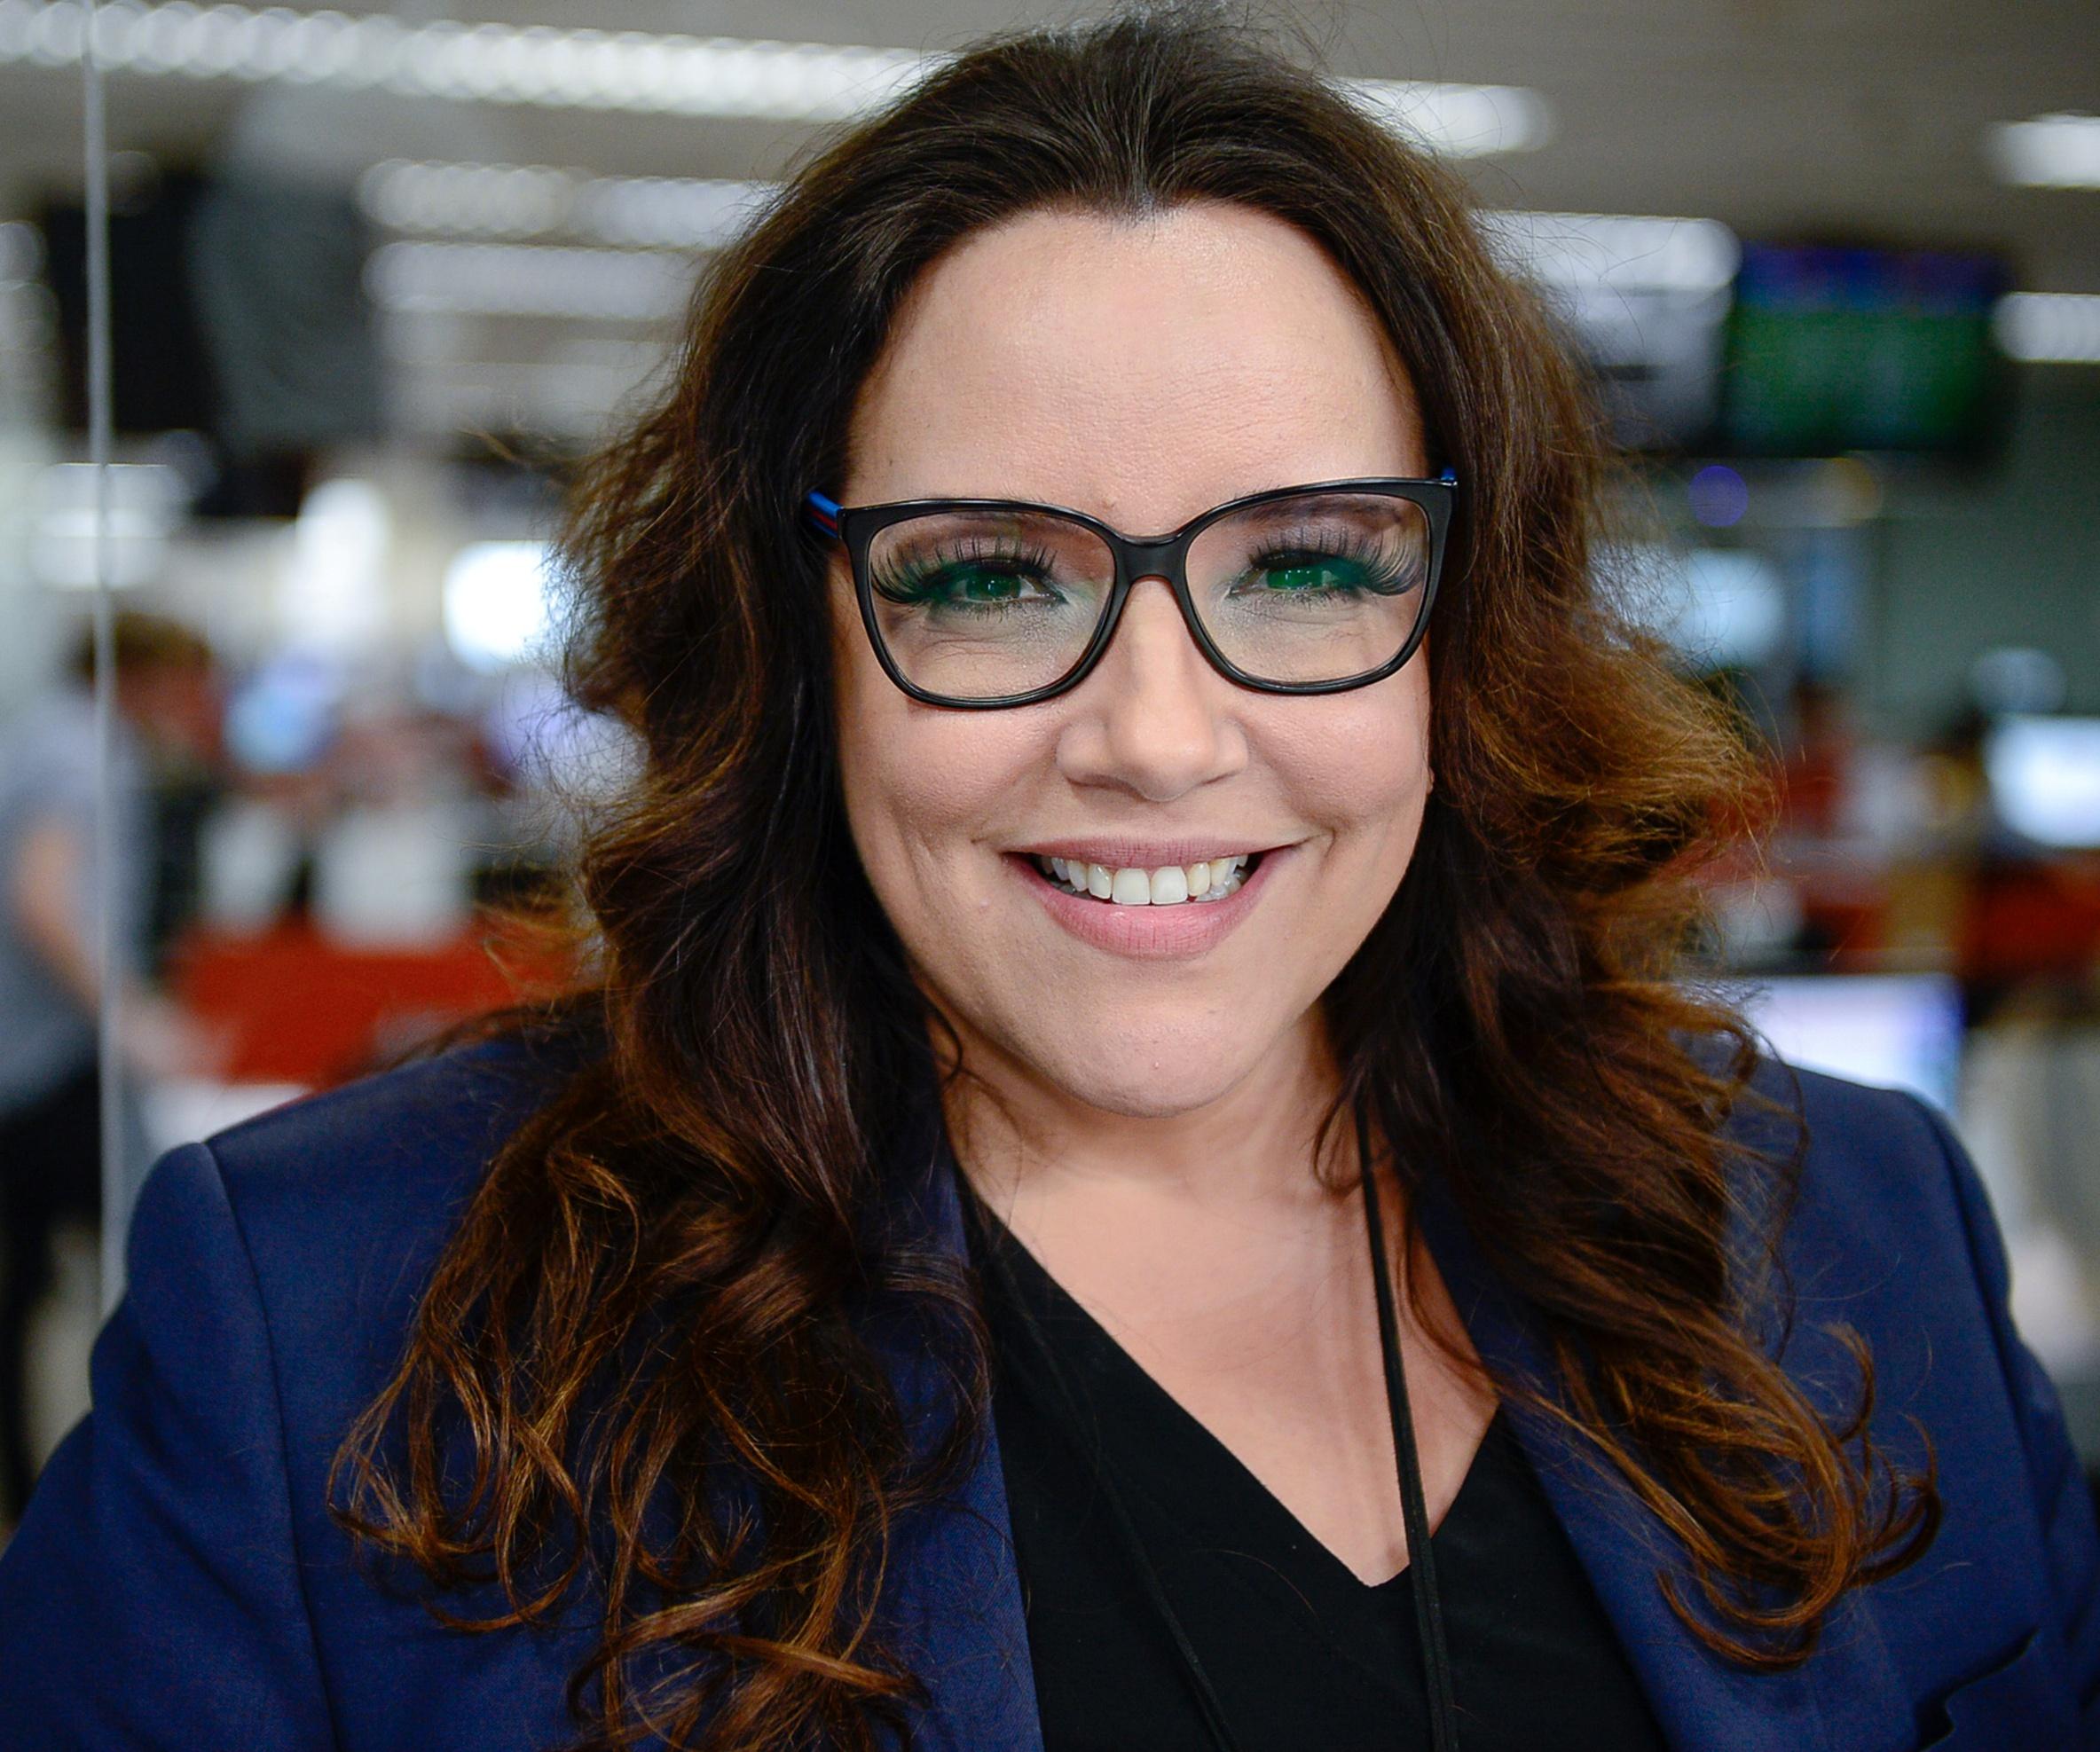 Cantora Ana Carolina